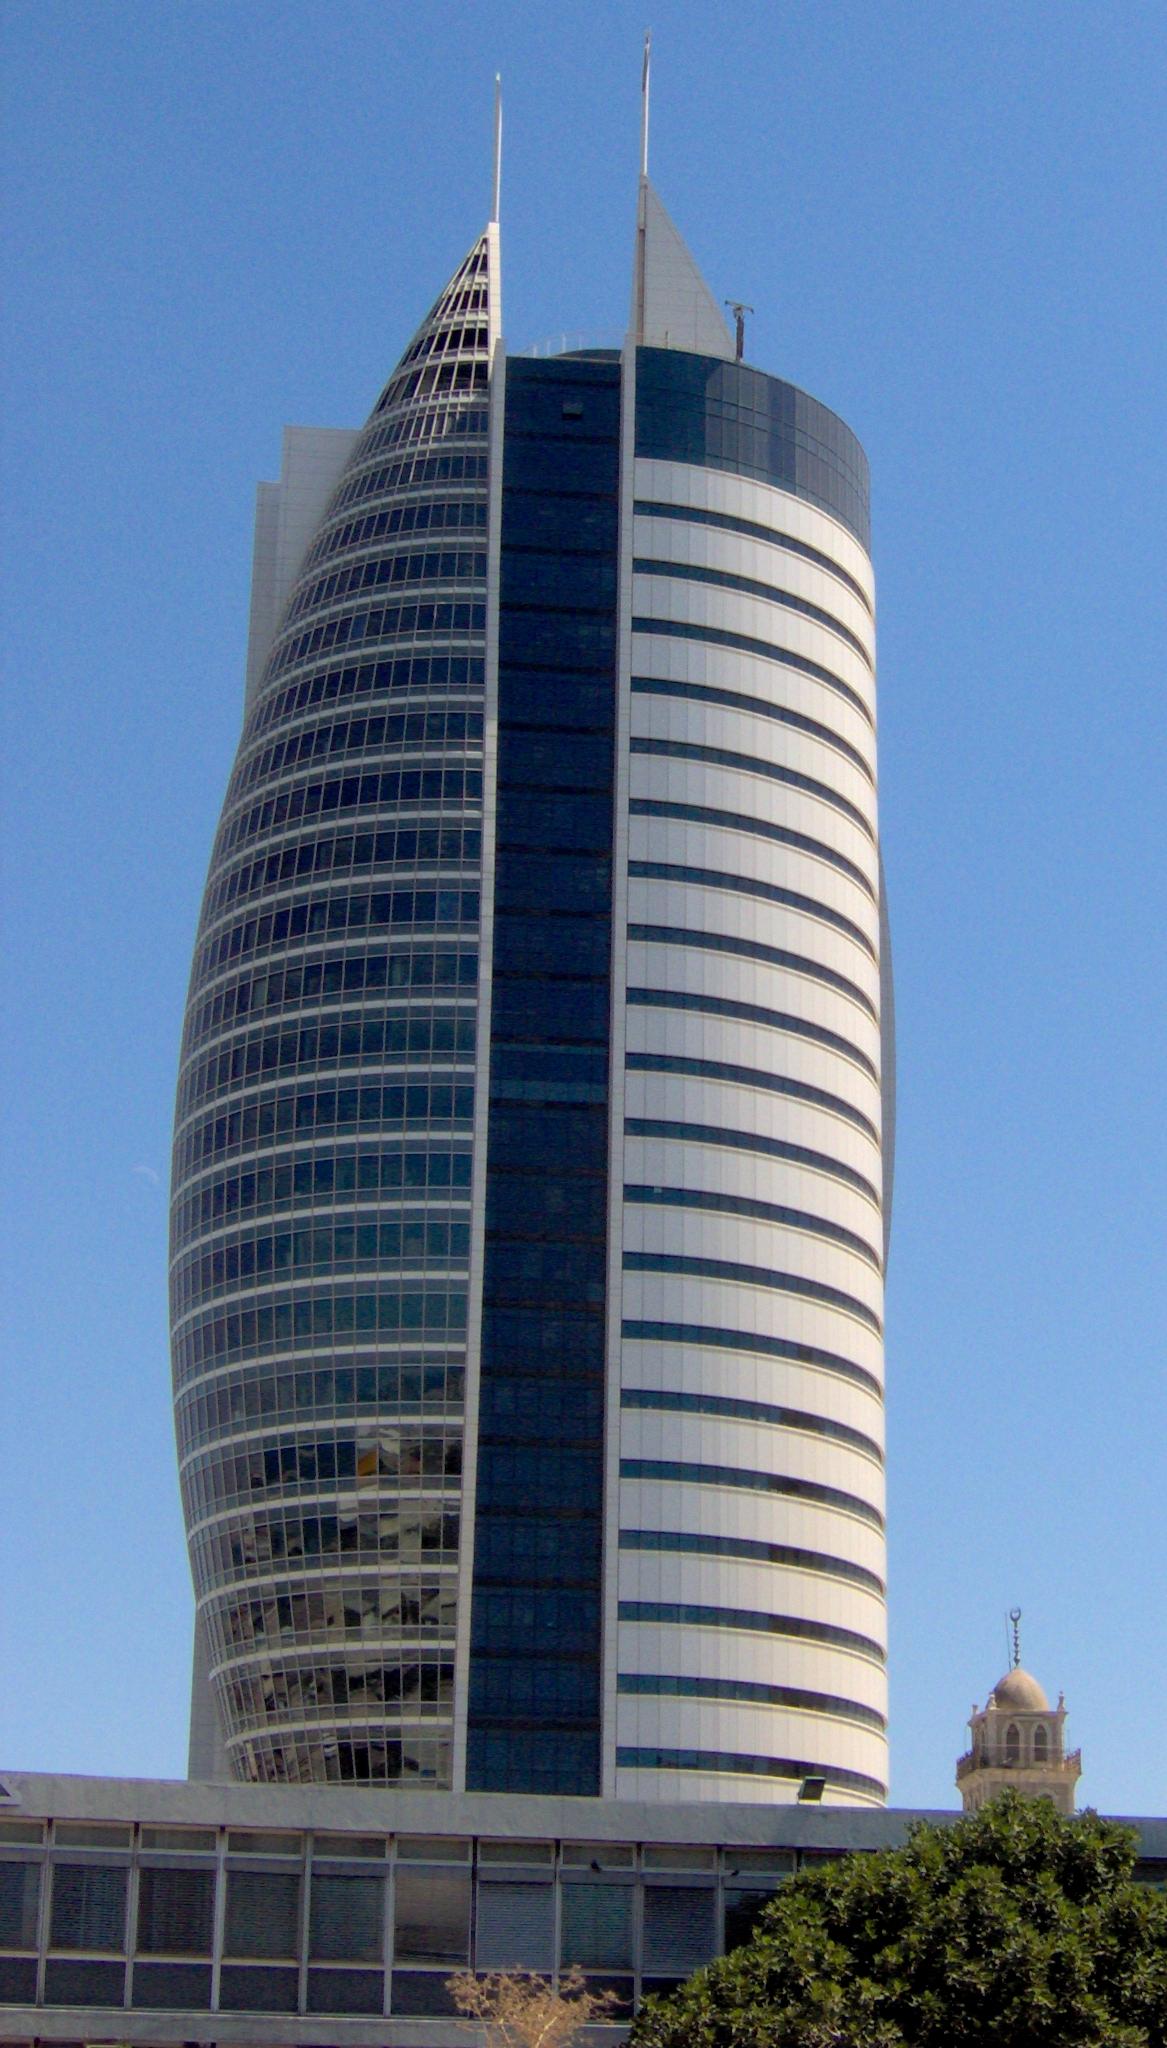 Homefront Tower Elevation : Sail tower wikidata